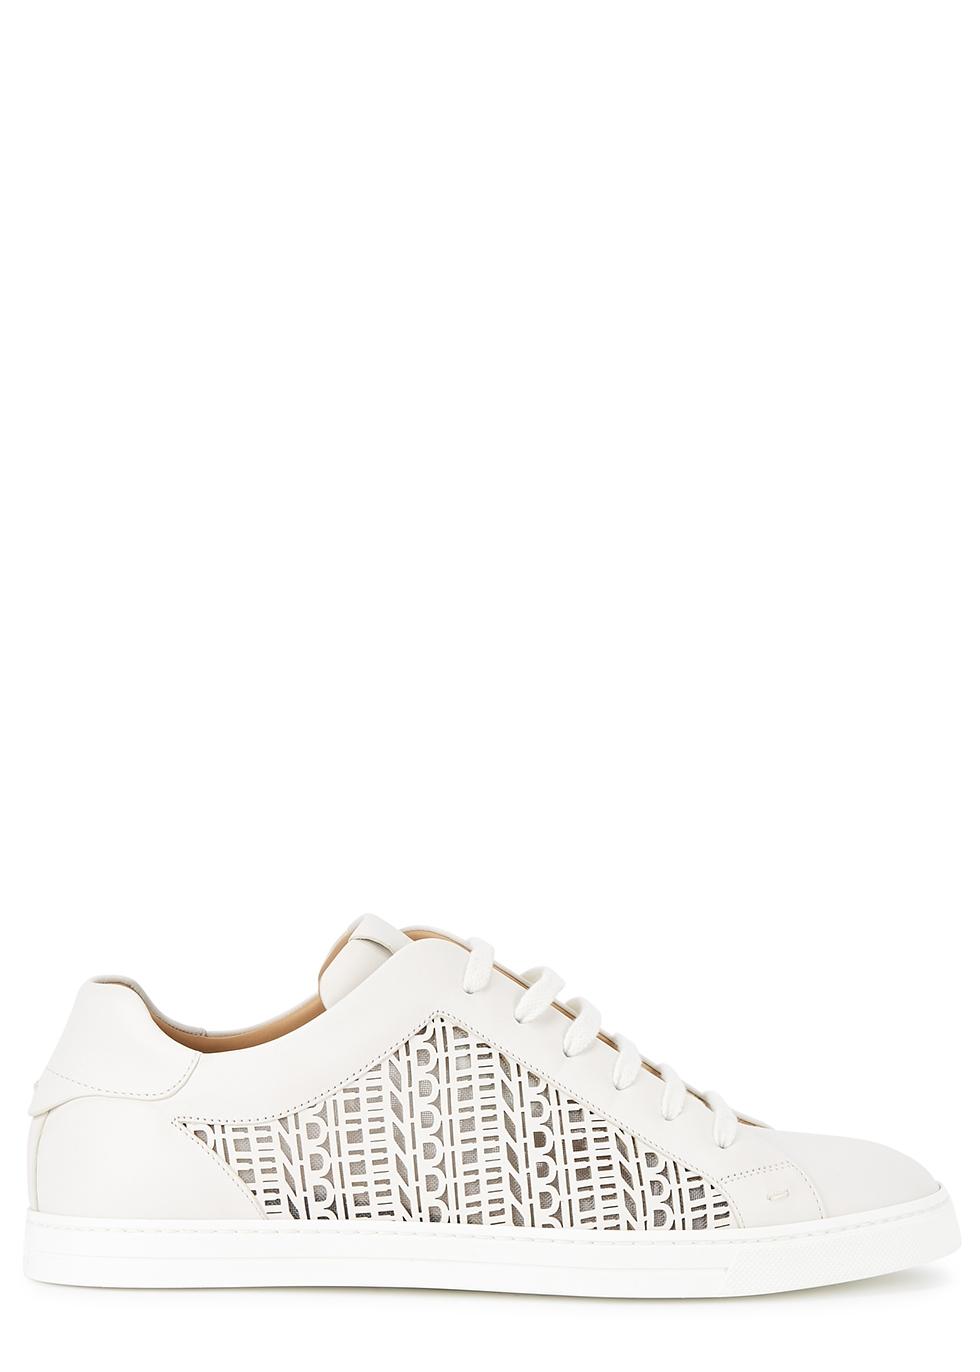 laser-cut leather sneakers - Harvey Nichols